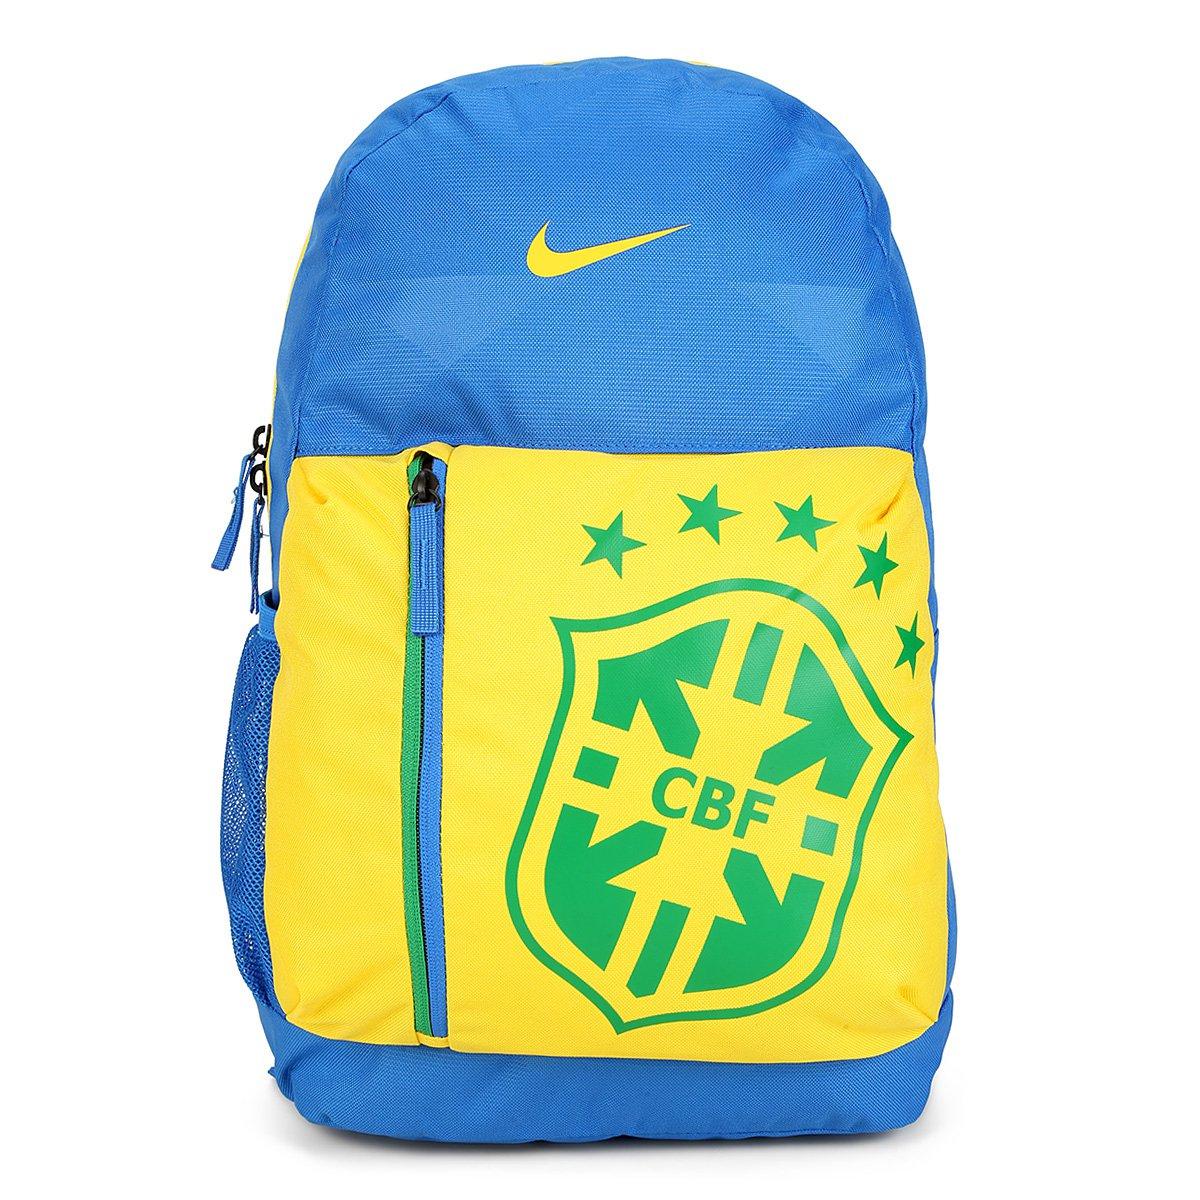 7e98bc683 FornecedorNetshoes. Mochila Brasil Infantil Nike CBF Stadium